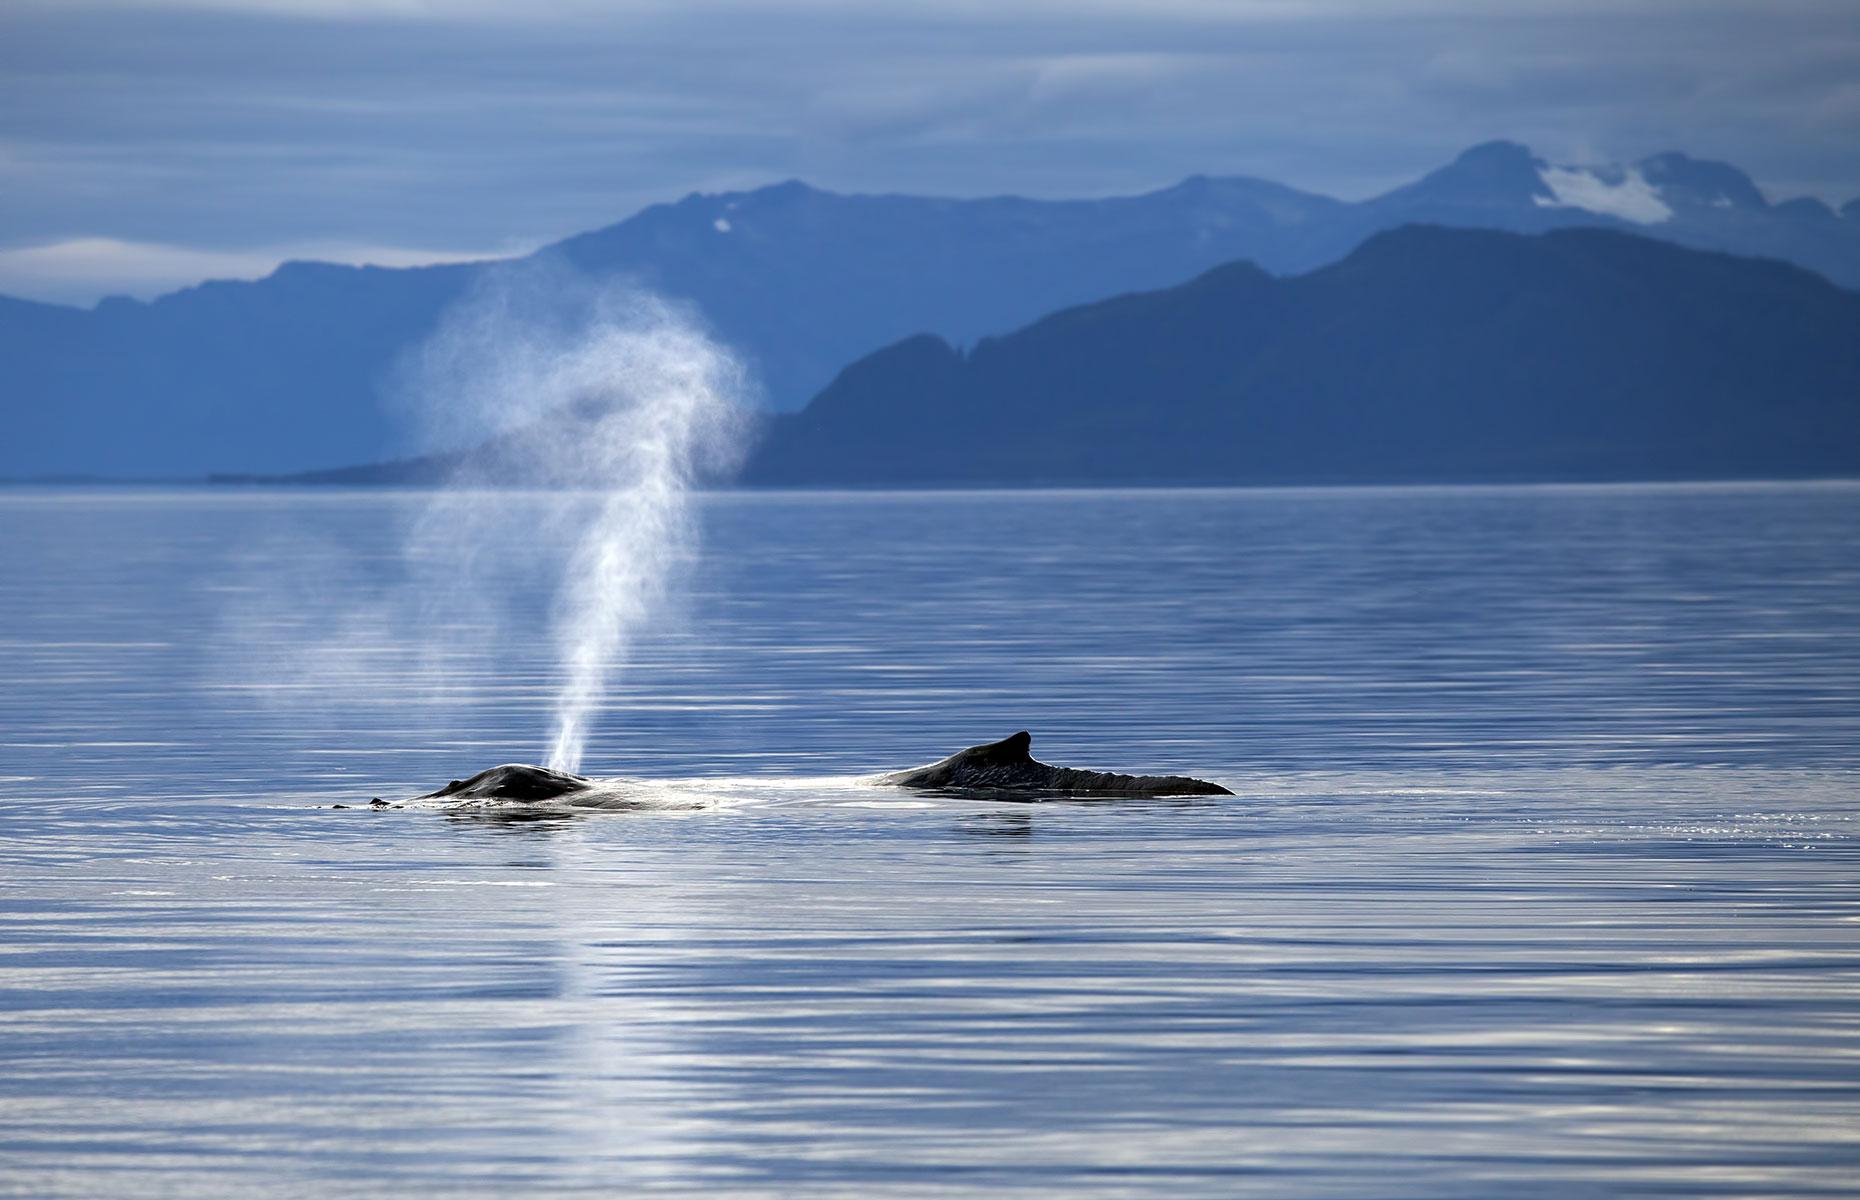 Whales in Inside Passage, Alaska